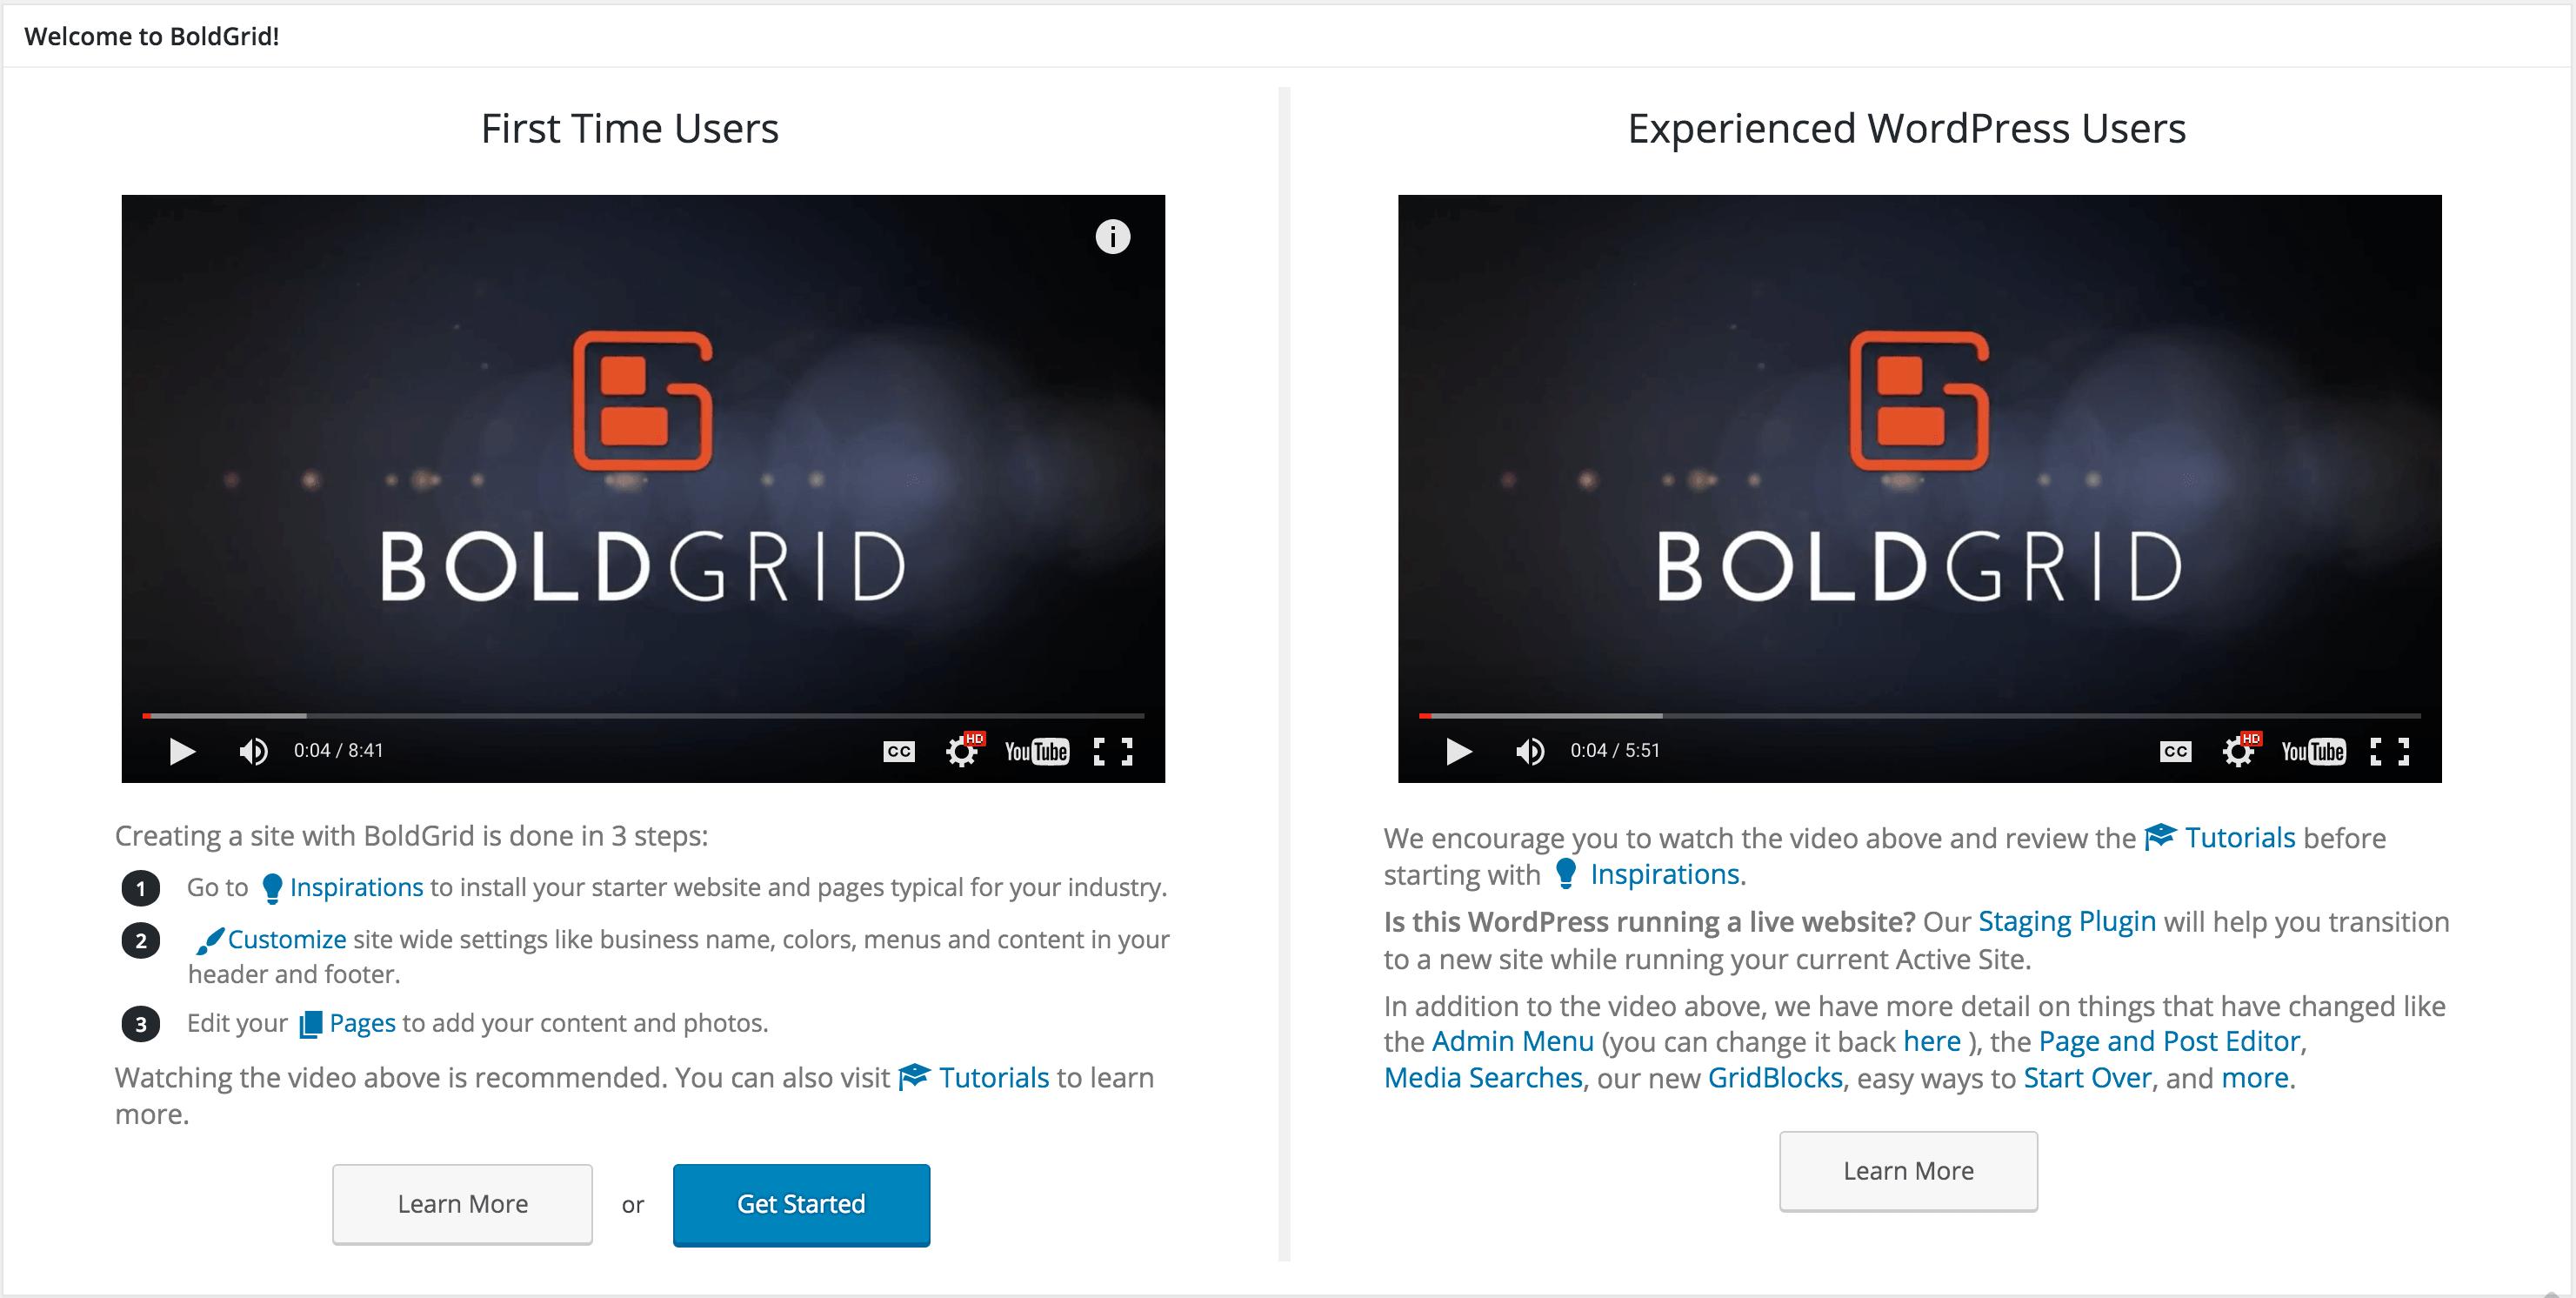 BoldGrid: WordPress and Wix vs Weebly Alternative